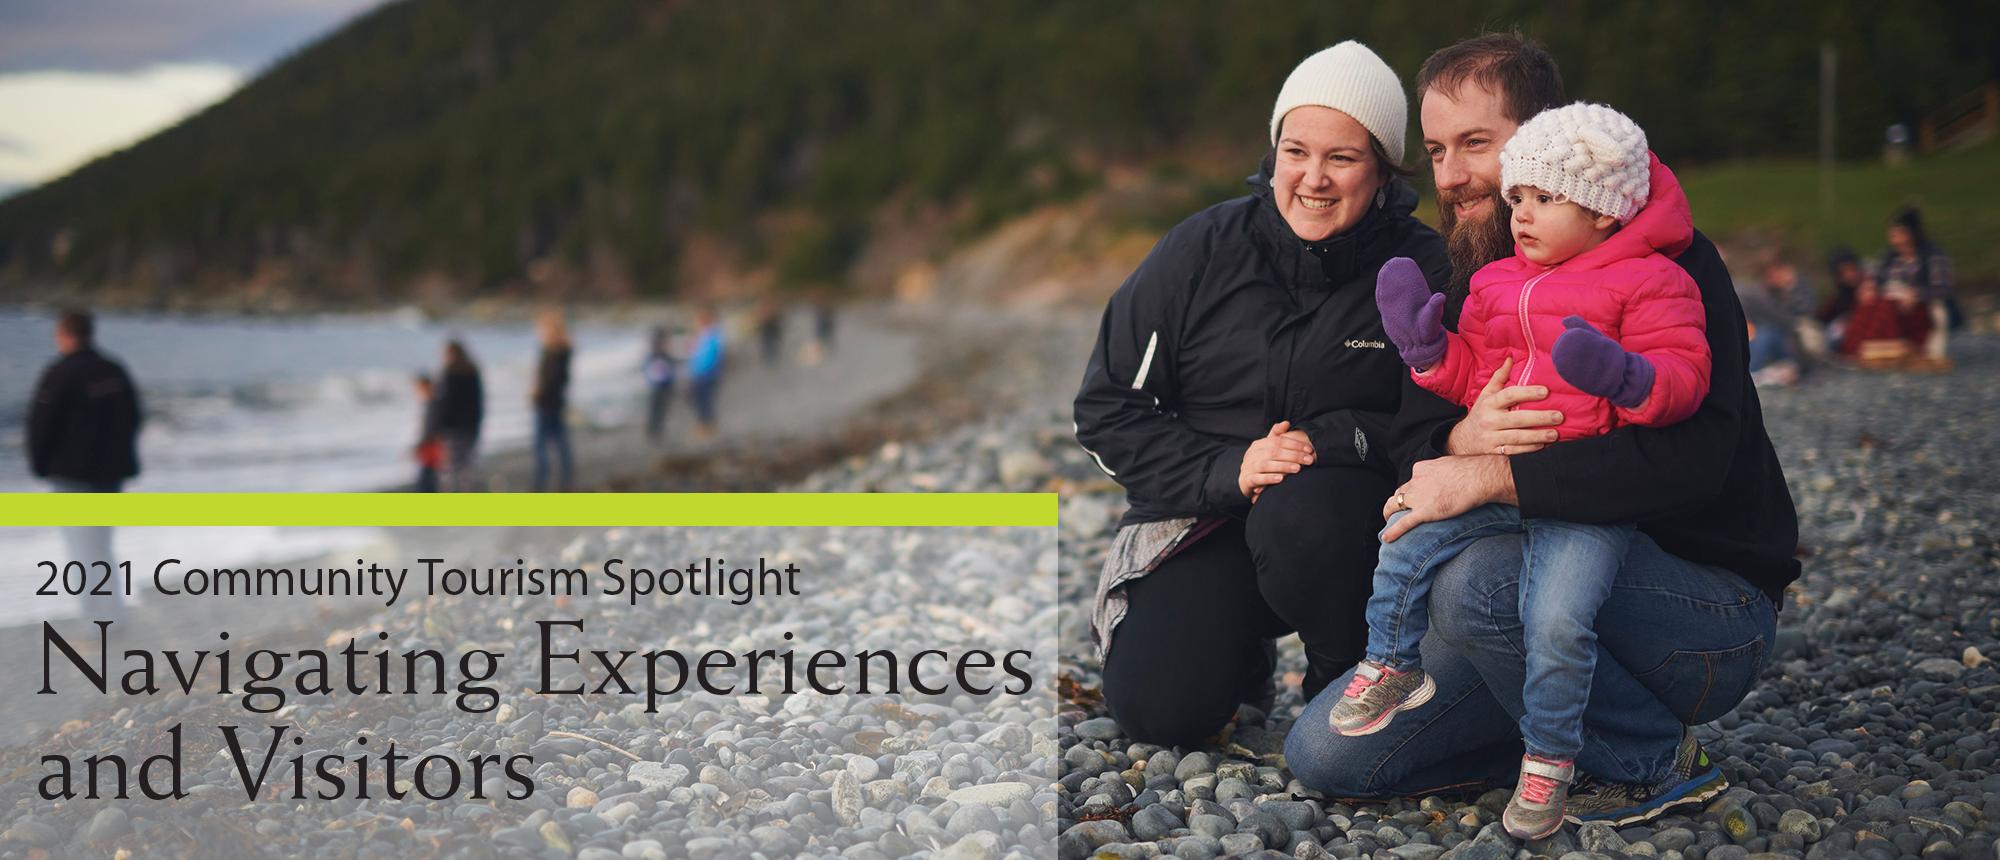 Community Tourism Spotlight – Navigating Experiences and Visitors